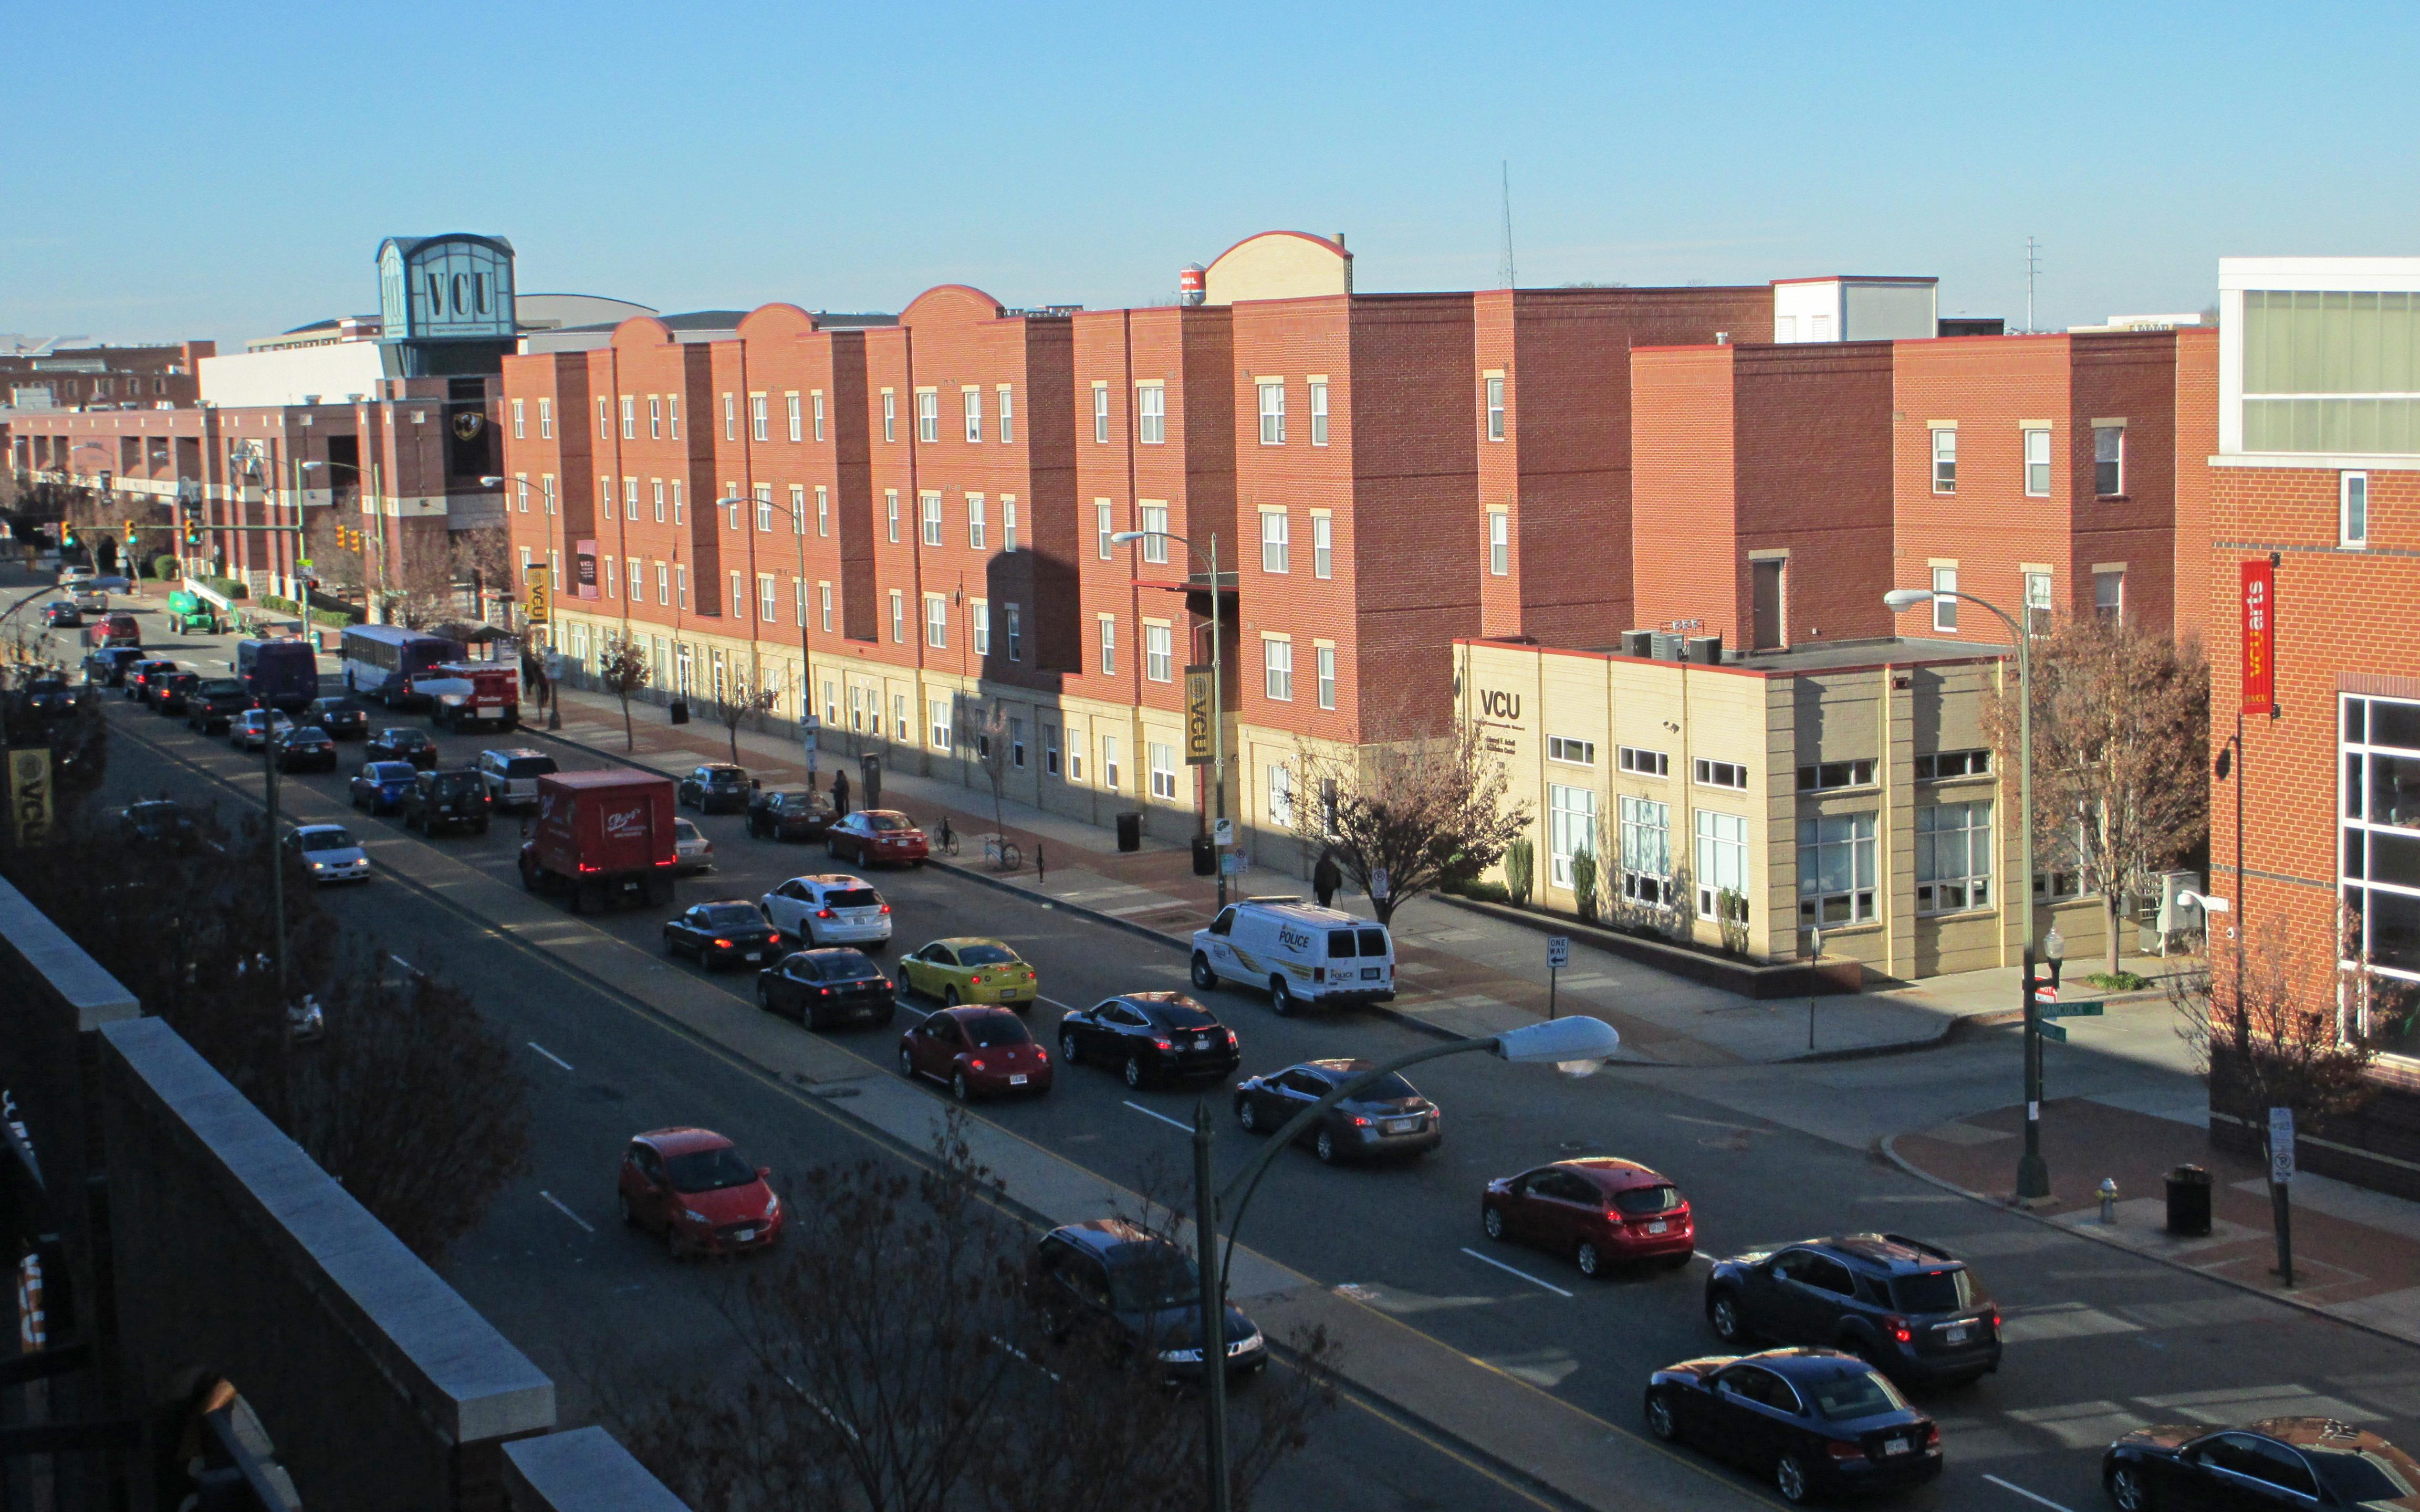 Vcu plans 7 5m dorm renovation richmond bizsense 3 bedroom apartments richmond va near vcu